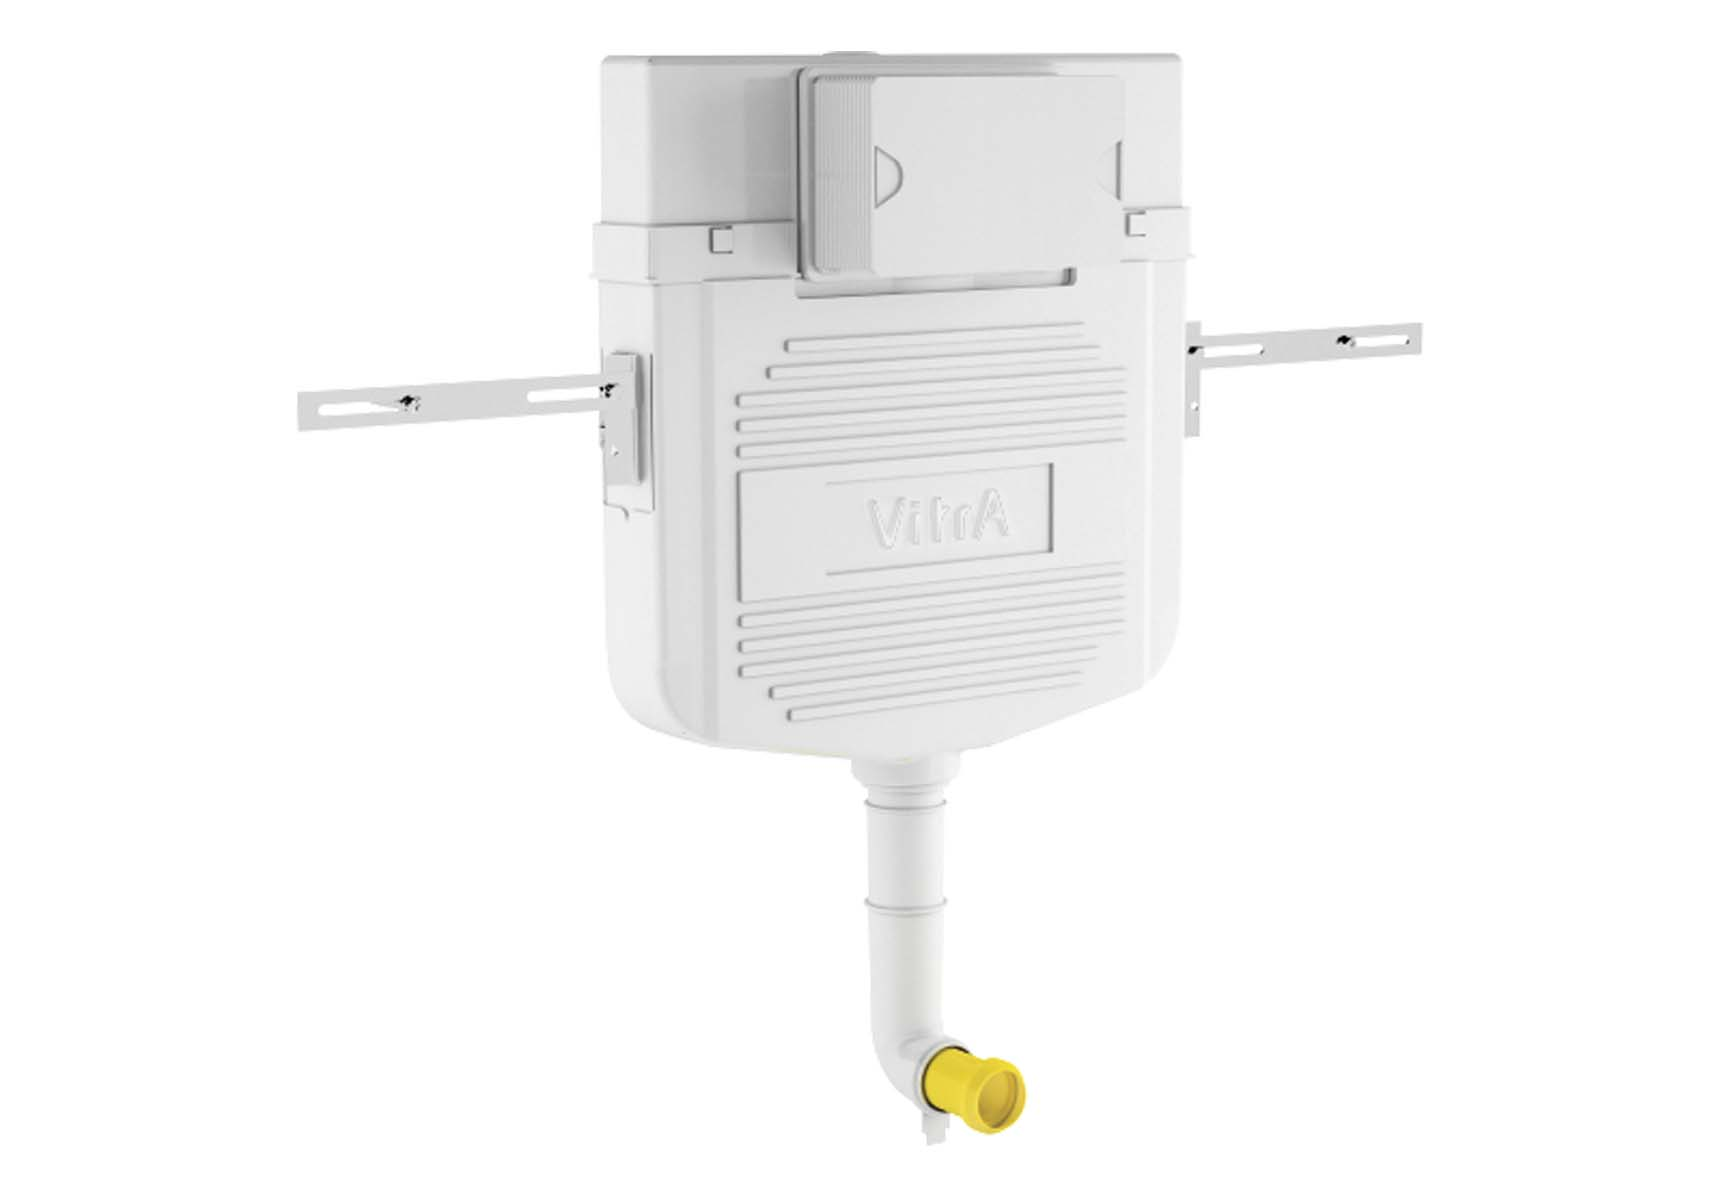 Standard Installation - 2,5/4 Liter Concealed Cistern Set(for Floor Standing Single WC Pan) - 8 cm